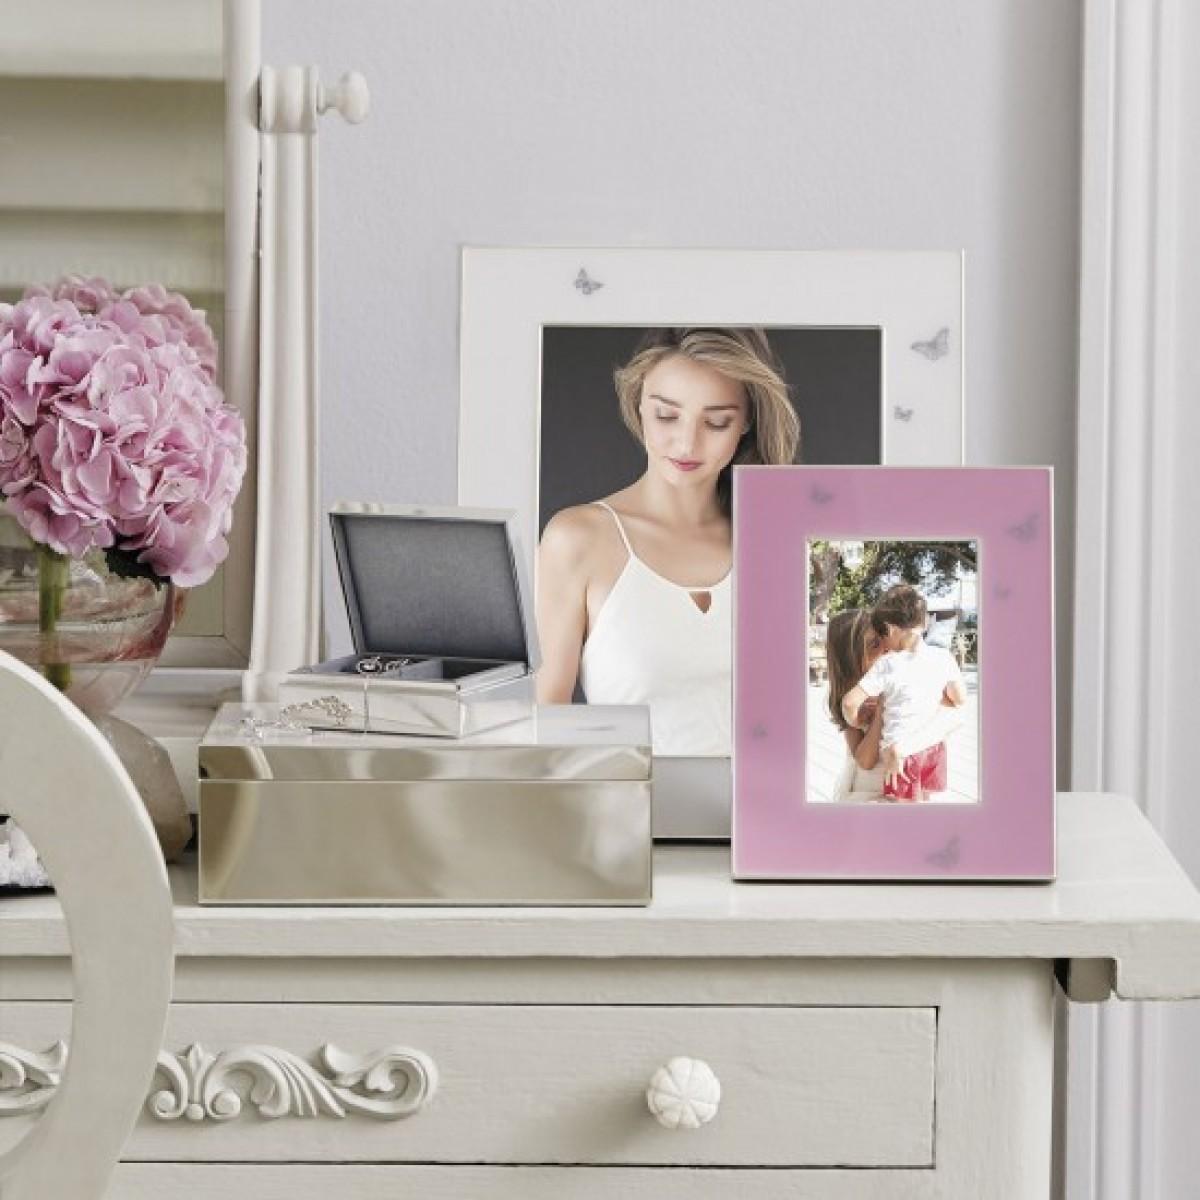 Royal Albert Miranda Kerr 8x10 White Picture Frame